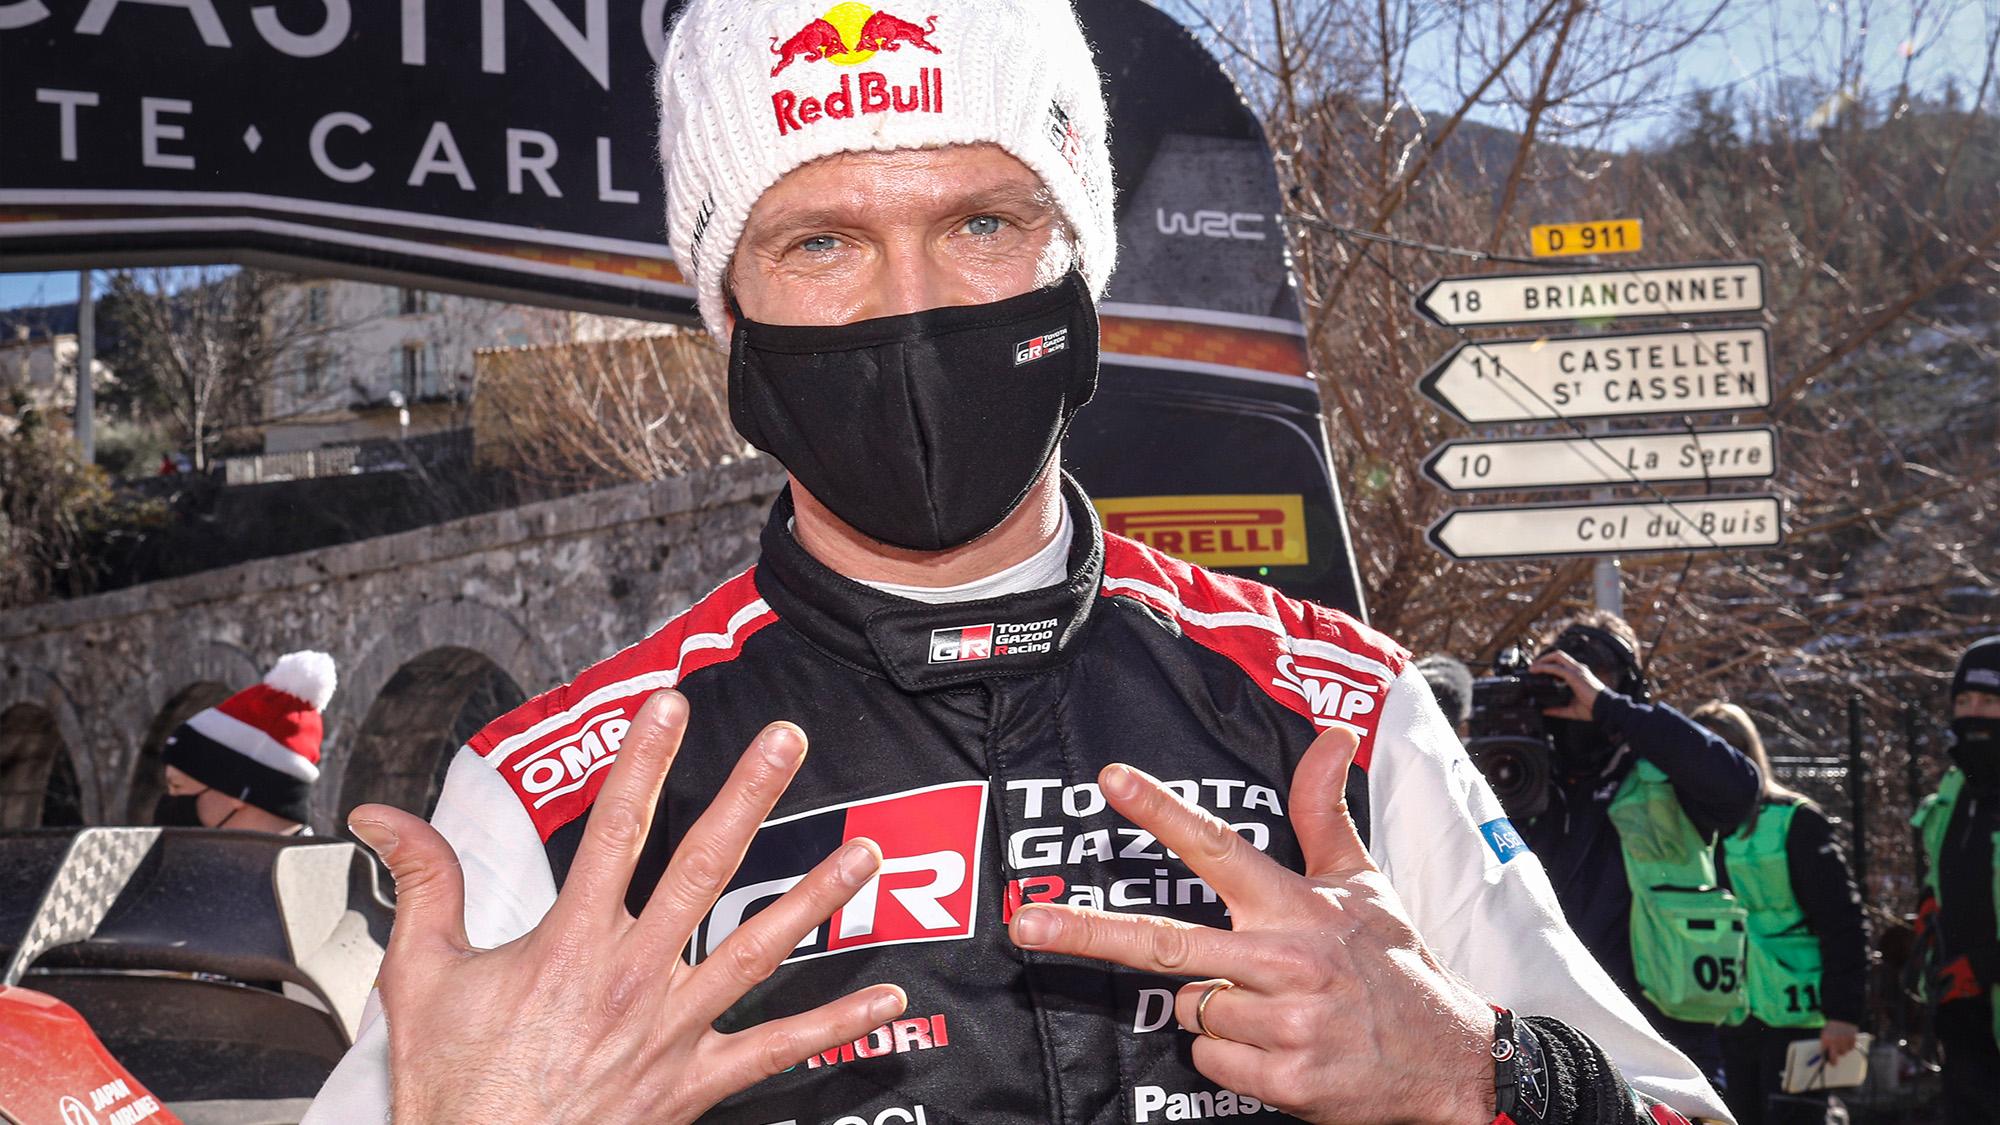 Sebastien Ogier celebrates his 8th Monte Carlo rally in 2021